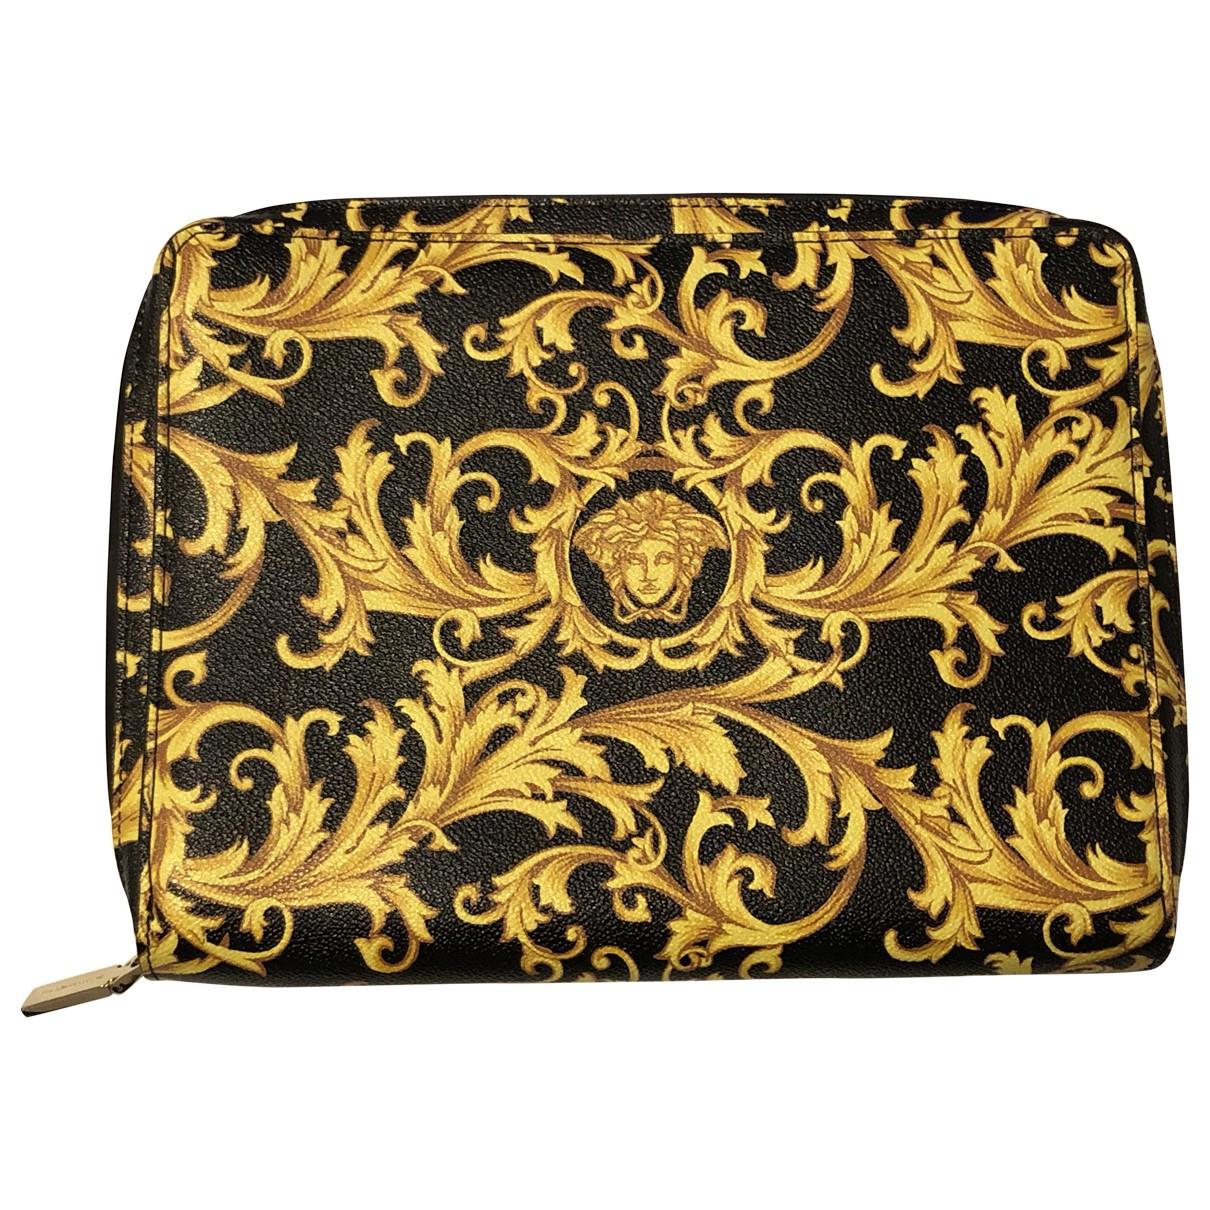 Versace \N Accessoires in  Gelb Leinen